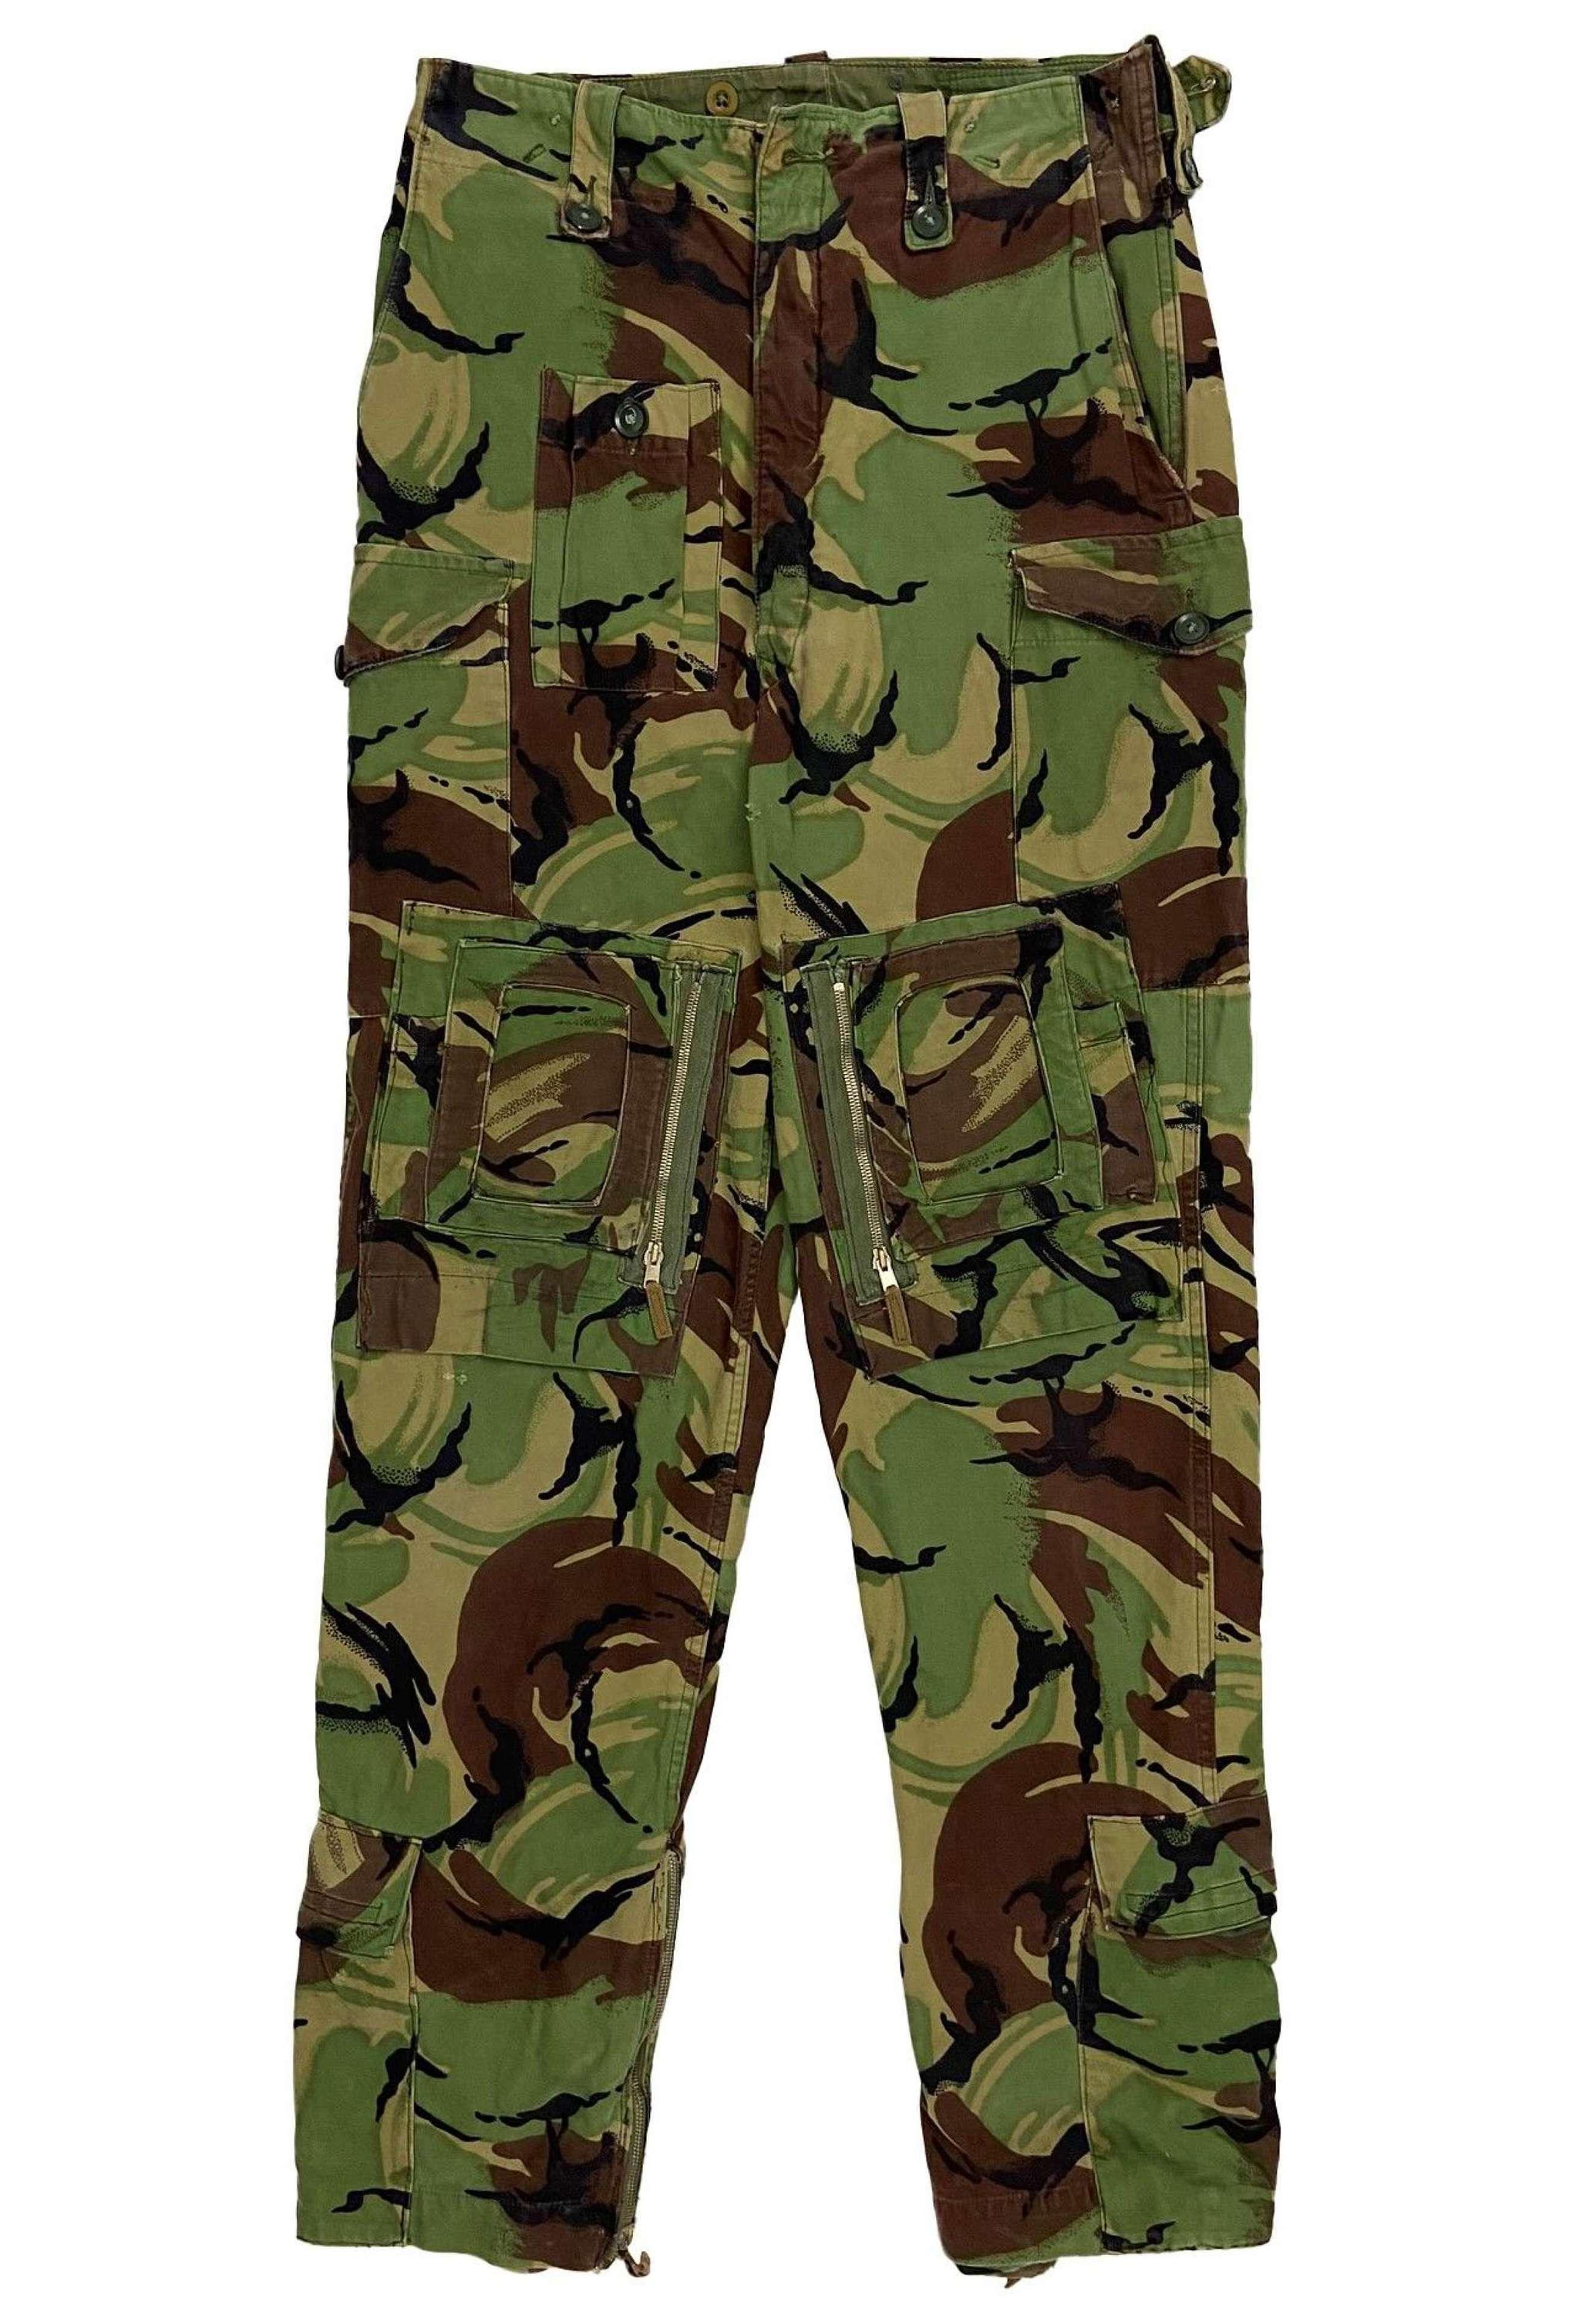 Original 1968 Pattern DPM Combat Trousers - Converted